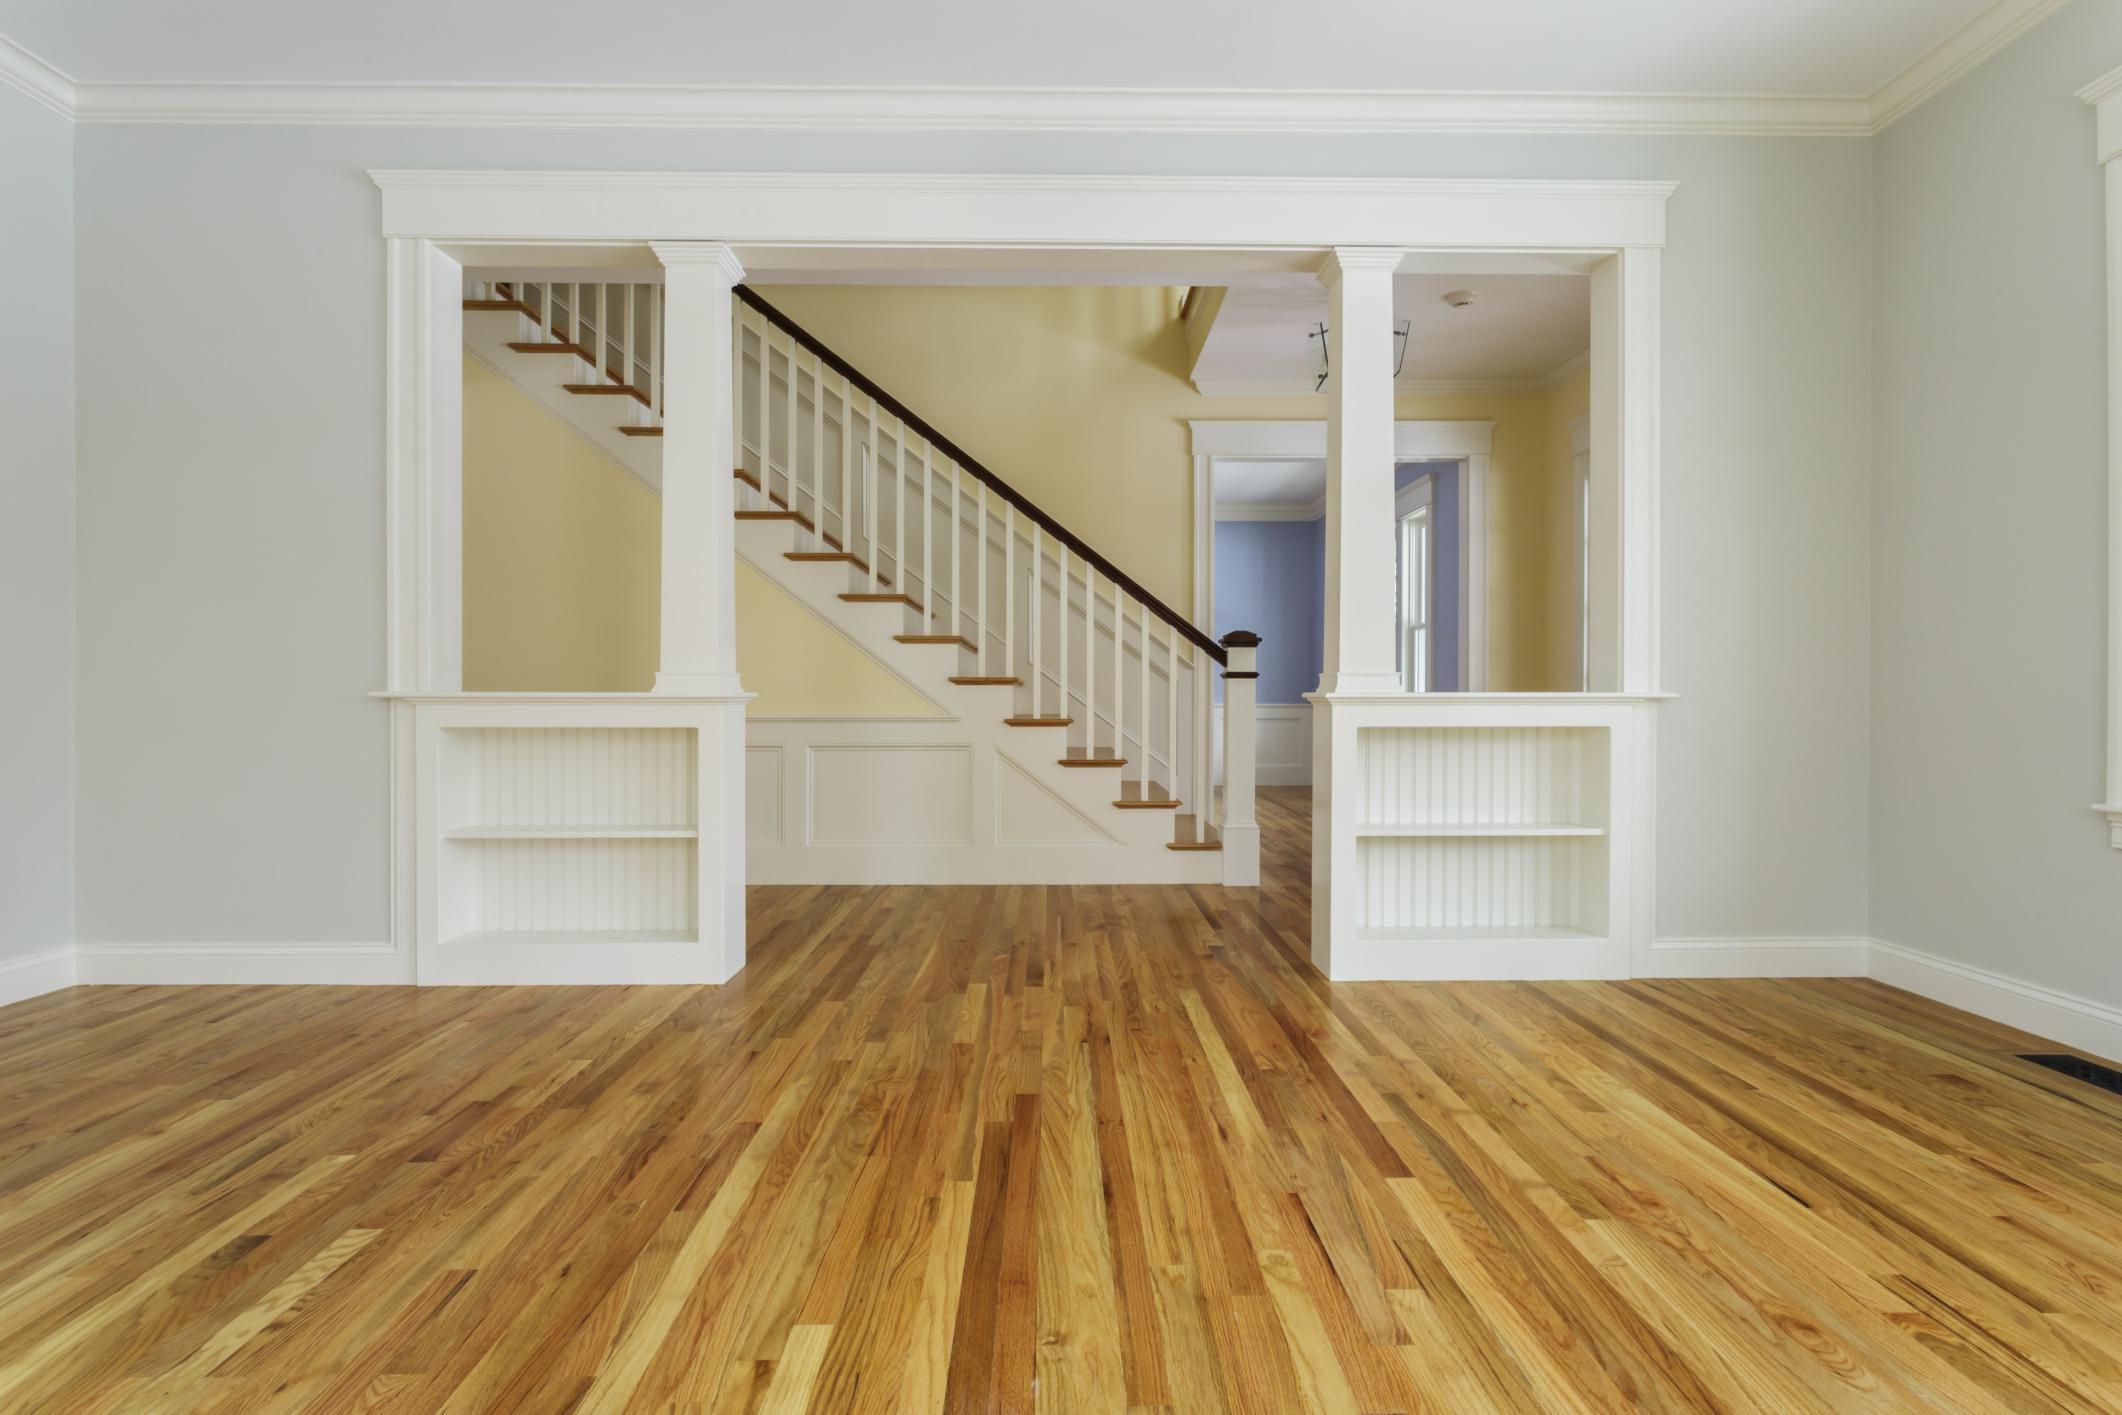 engineered hardwood floor scratch repair kit of guide to solid hardwood floors regarding 168686571 56a49f213df78cf772834e24